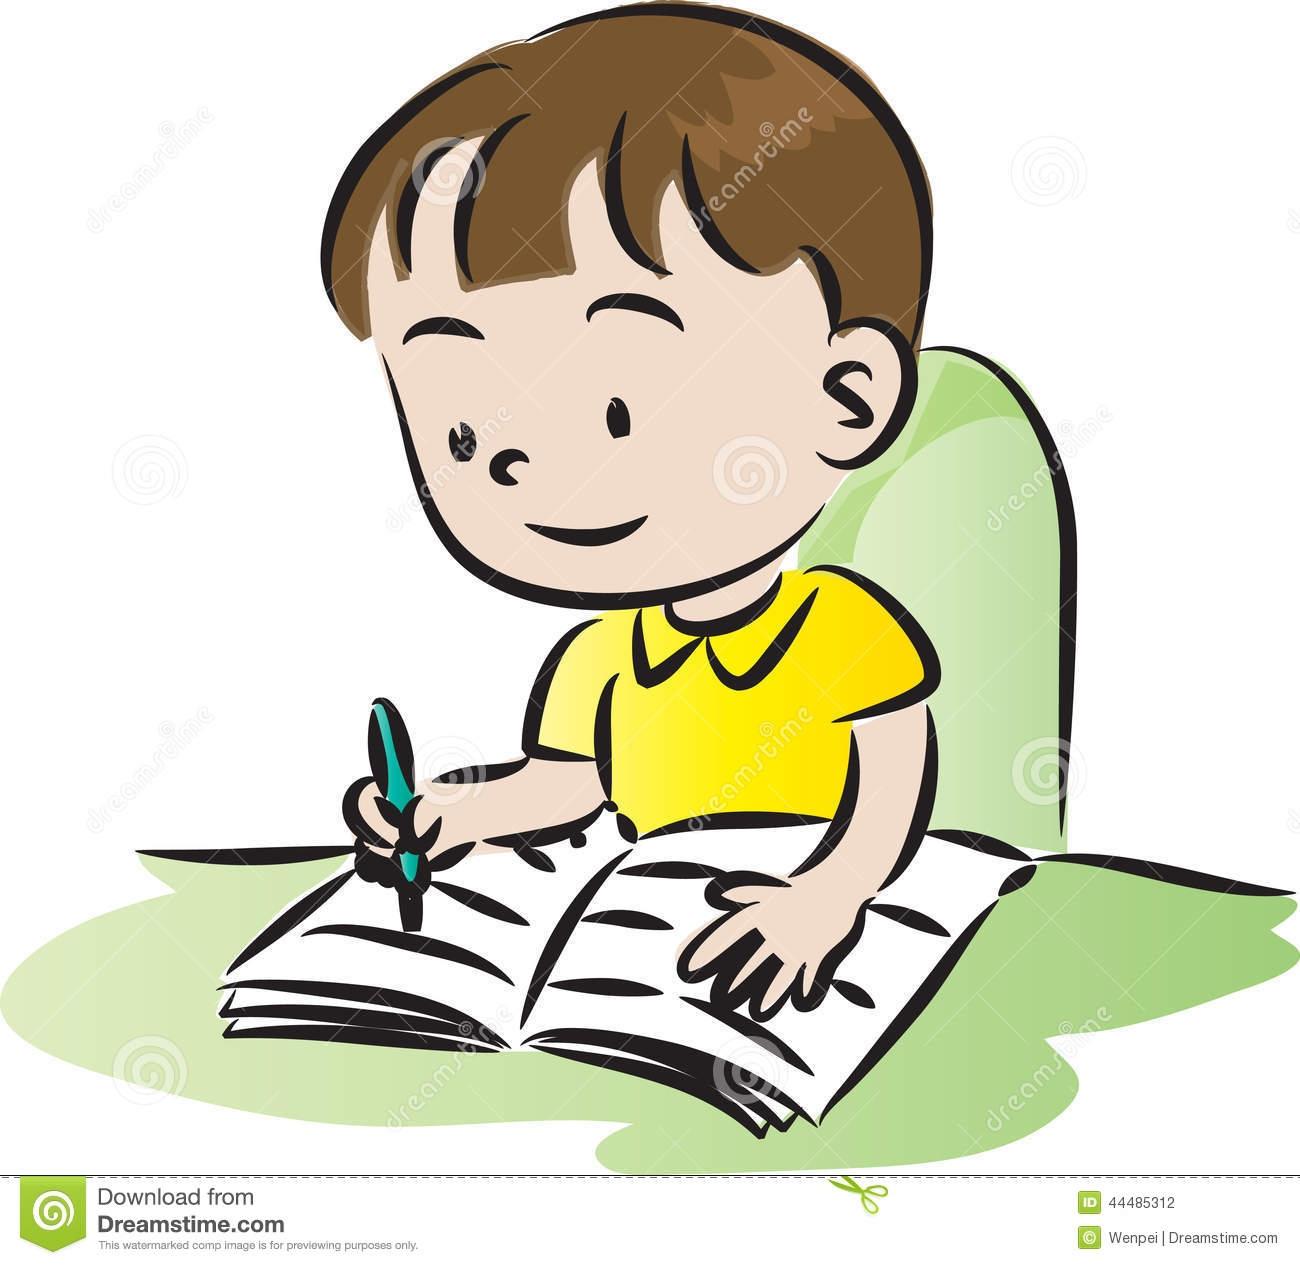 1300x1265 Children Homework Clipart, Explore Pictures